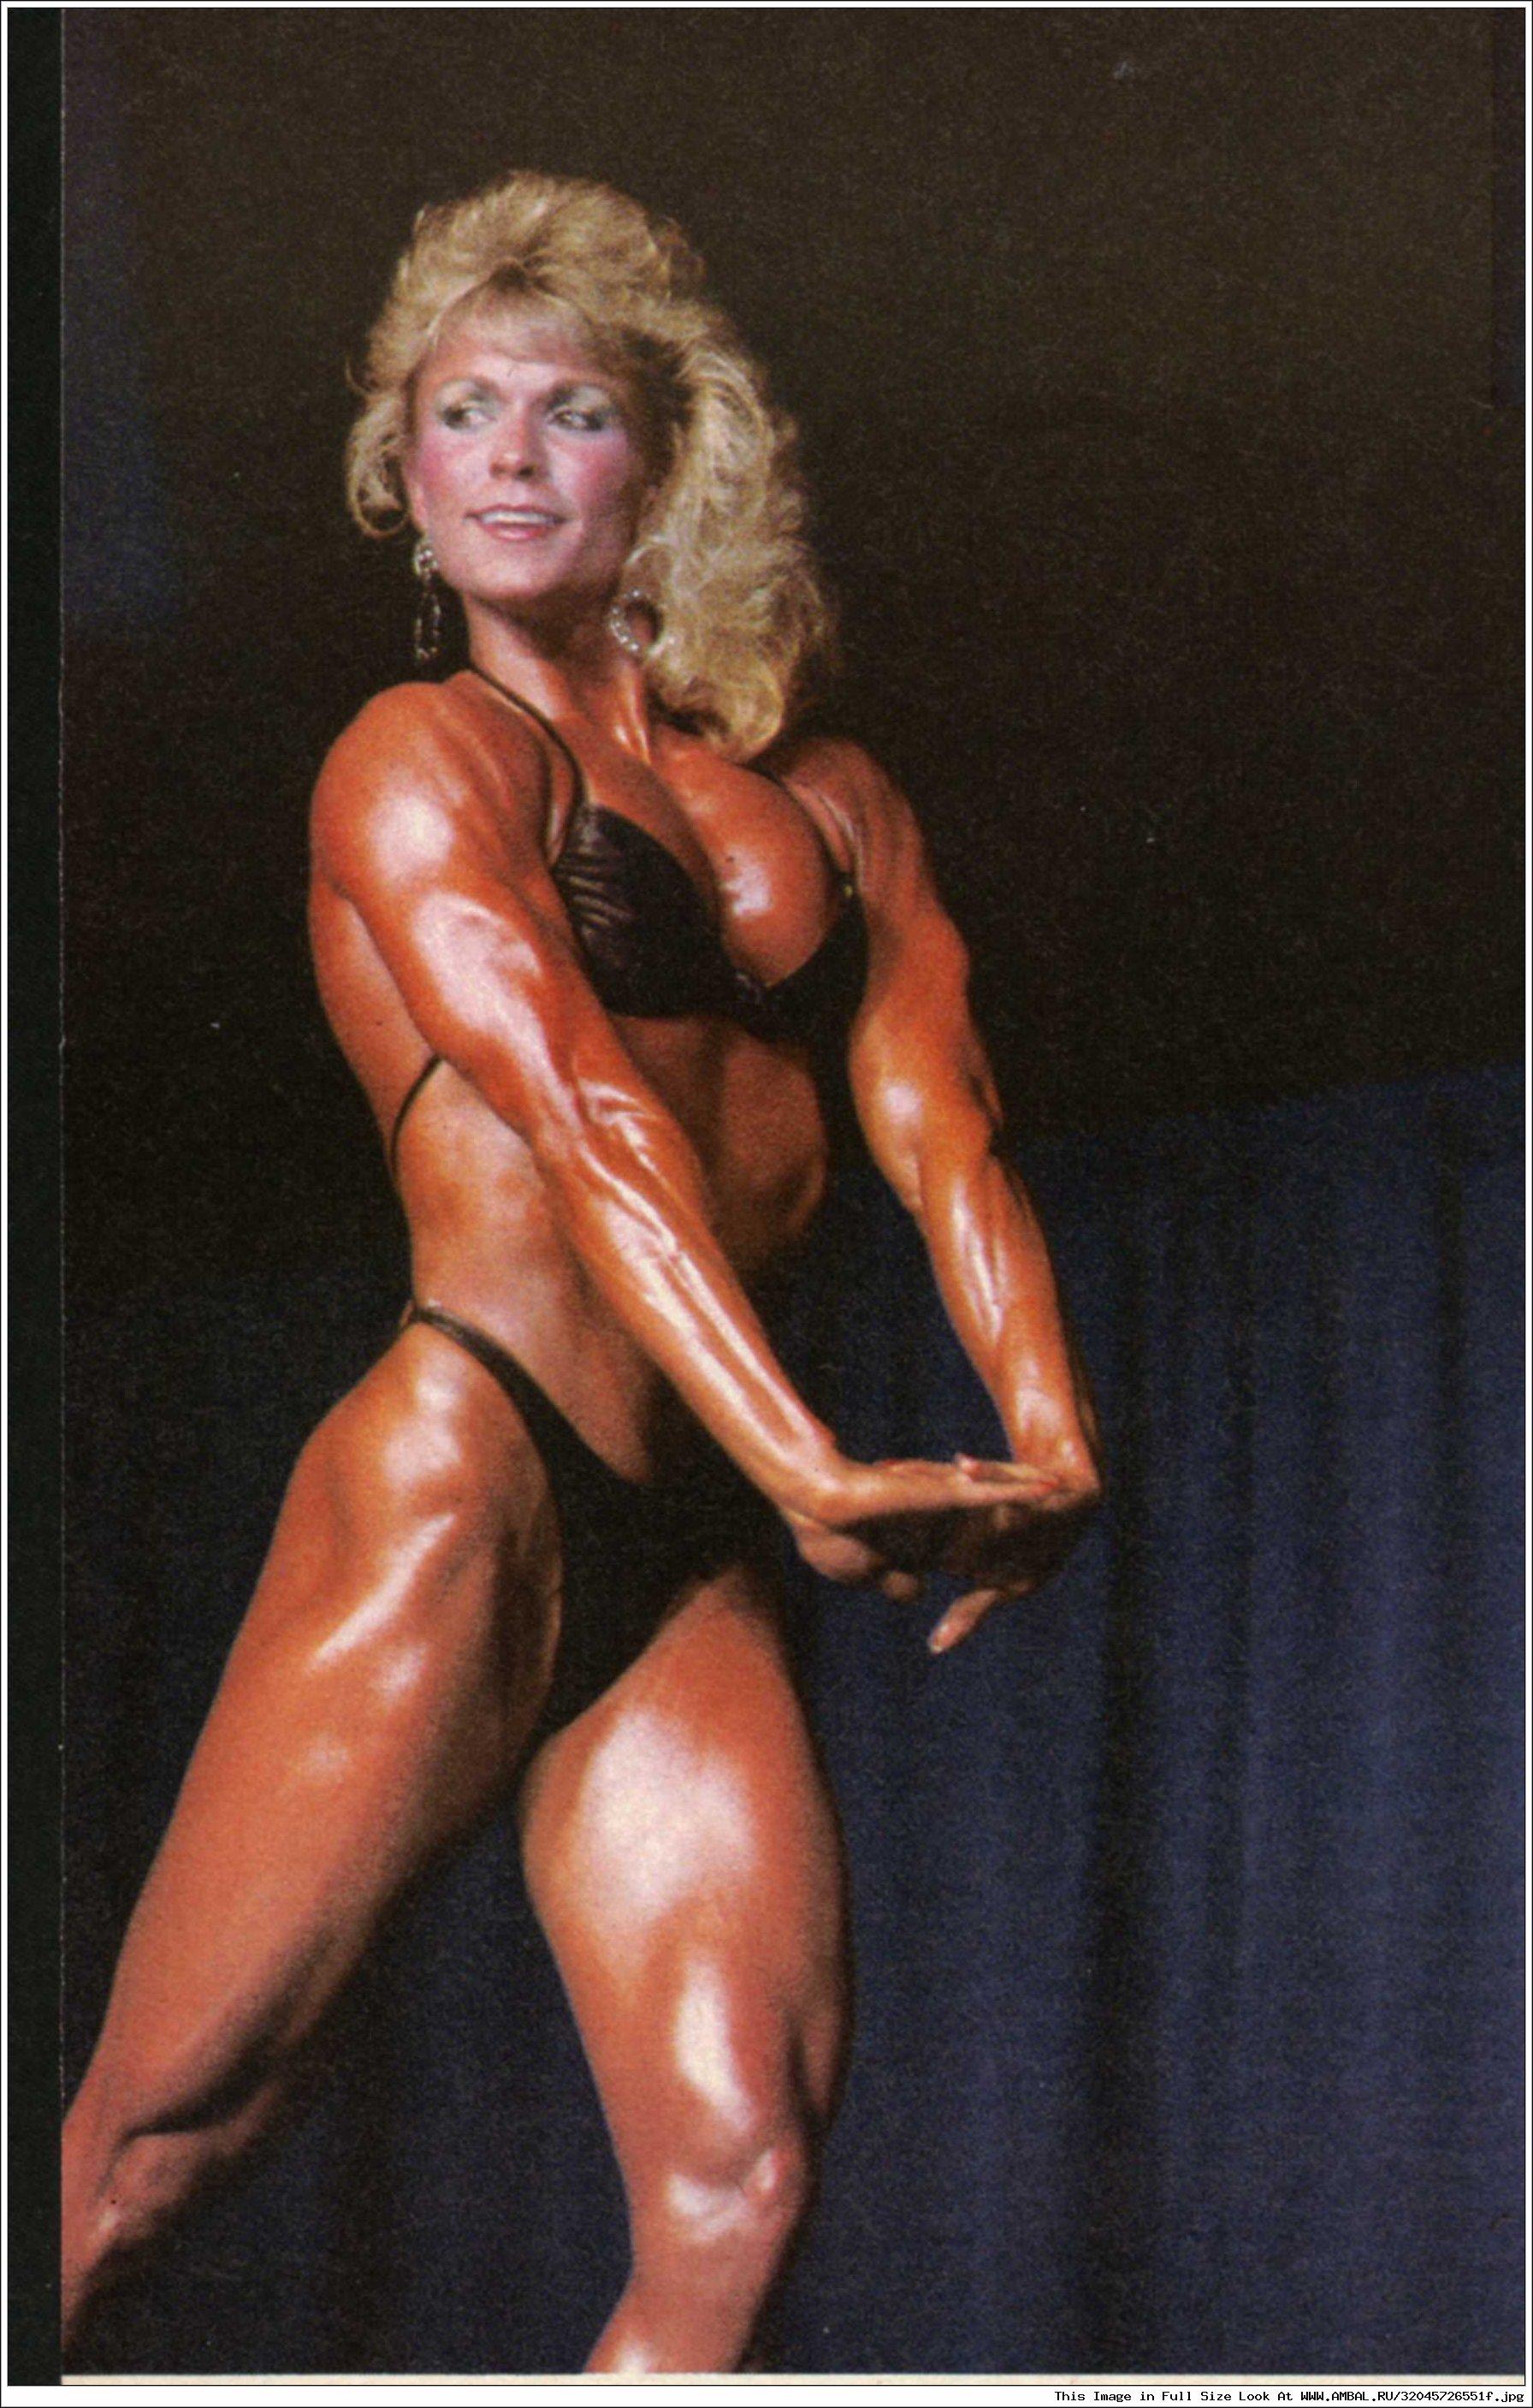 Tonya knight nude pics sex images